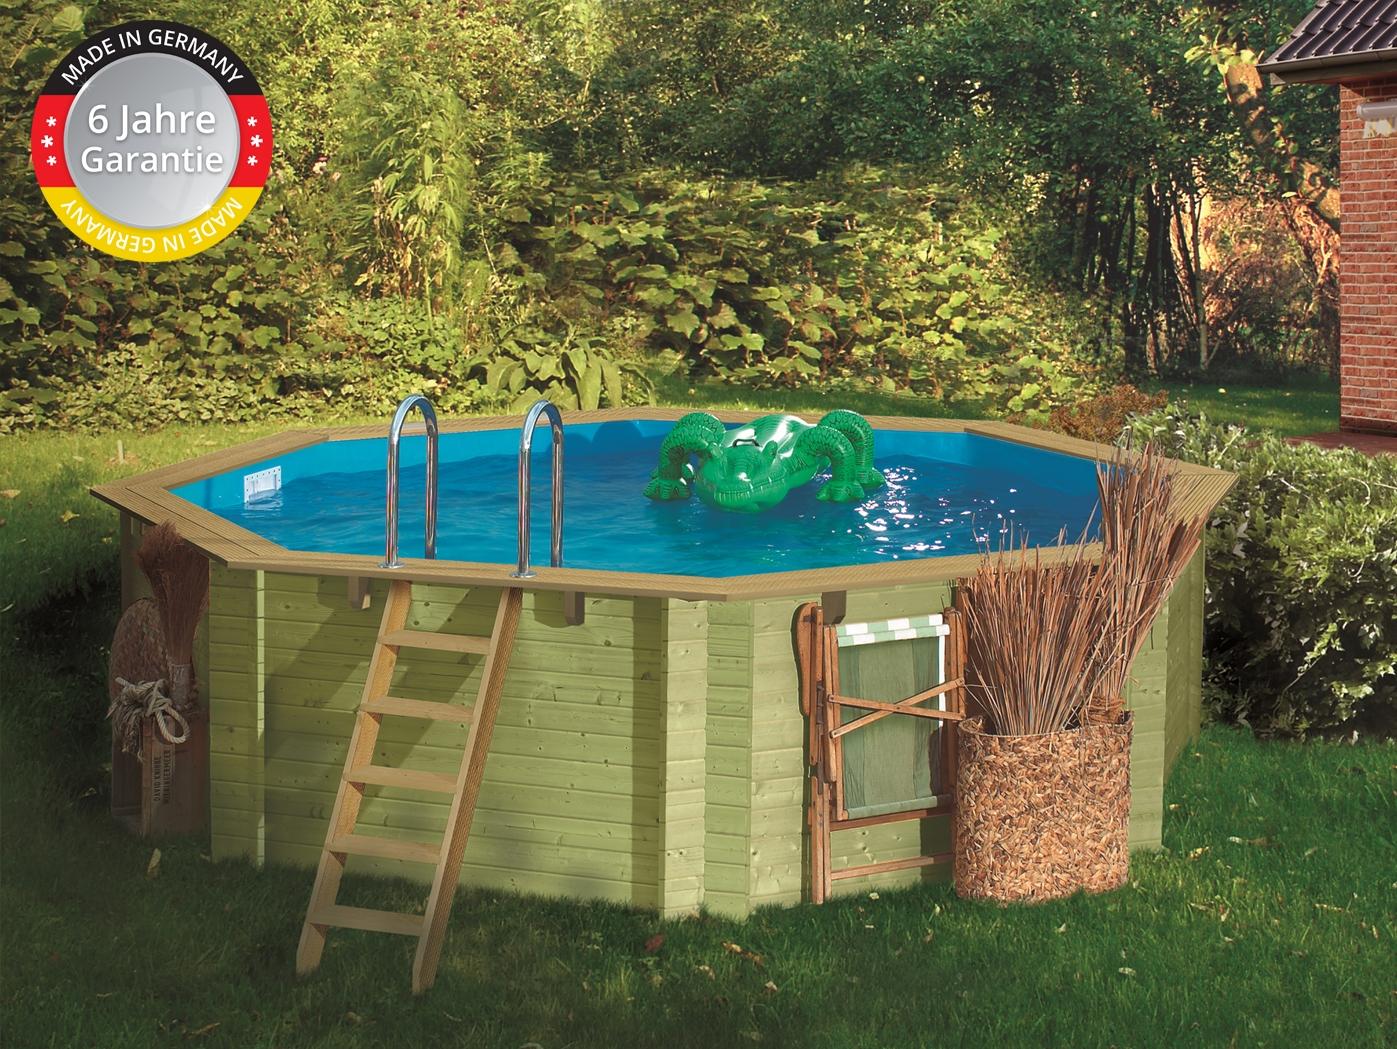 Schwimmbecken Holz Pool 4,00x1,20m 0,6mm Blau Komplettset Pool Edelstahl  Leiter